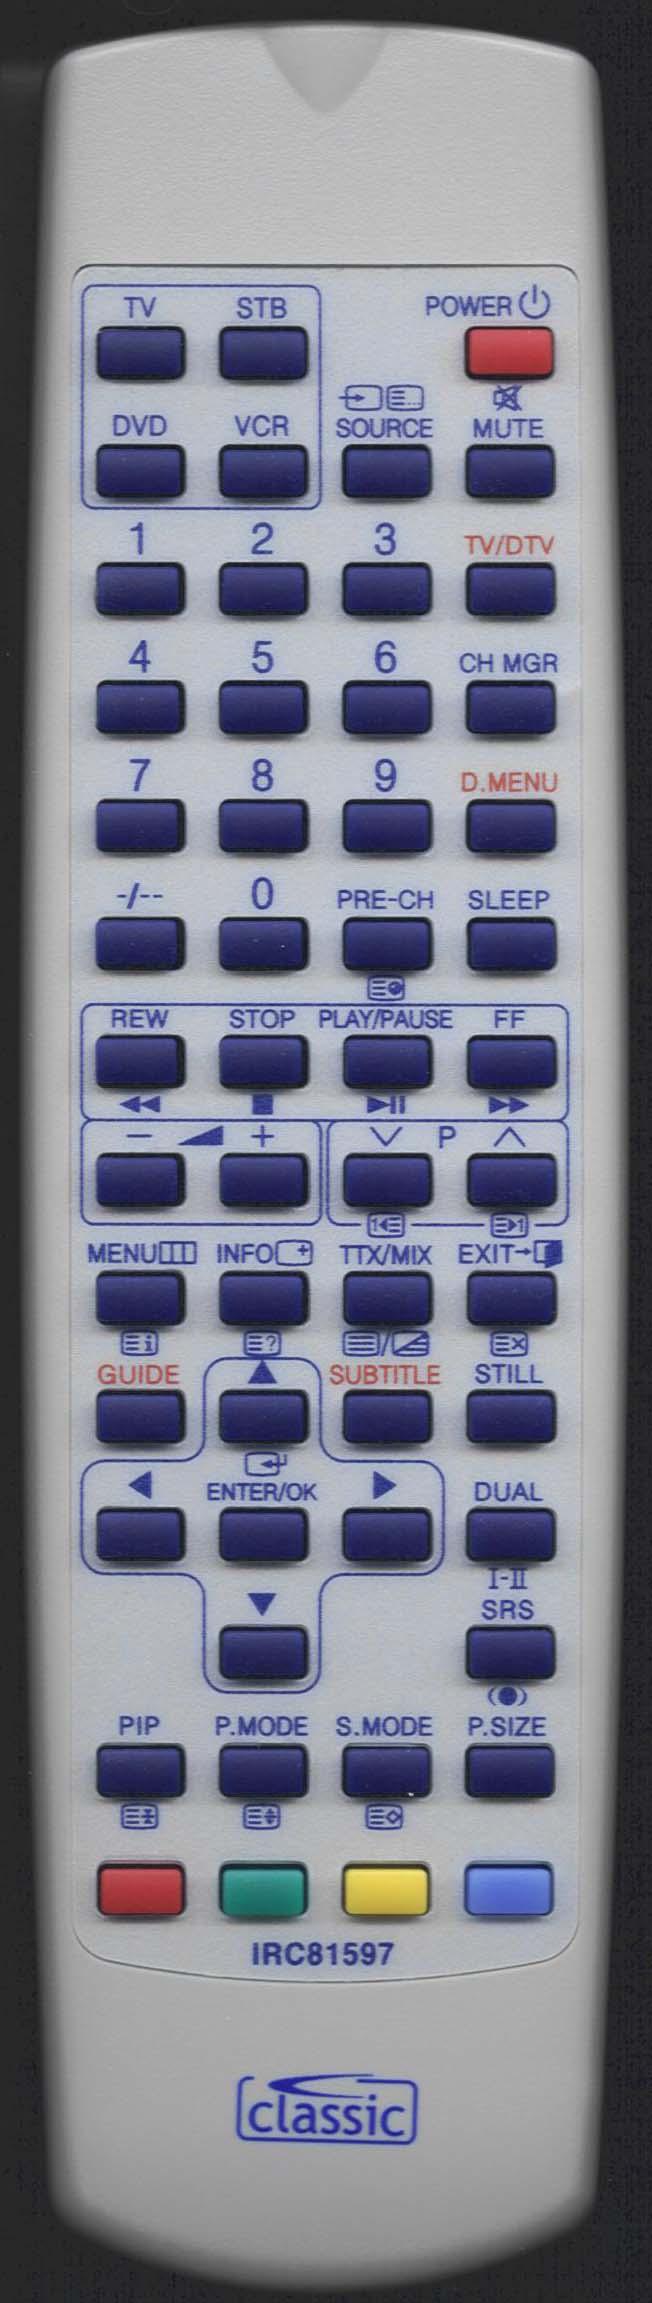 SAMSUNG LE26R73BD Remote Control Alternative